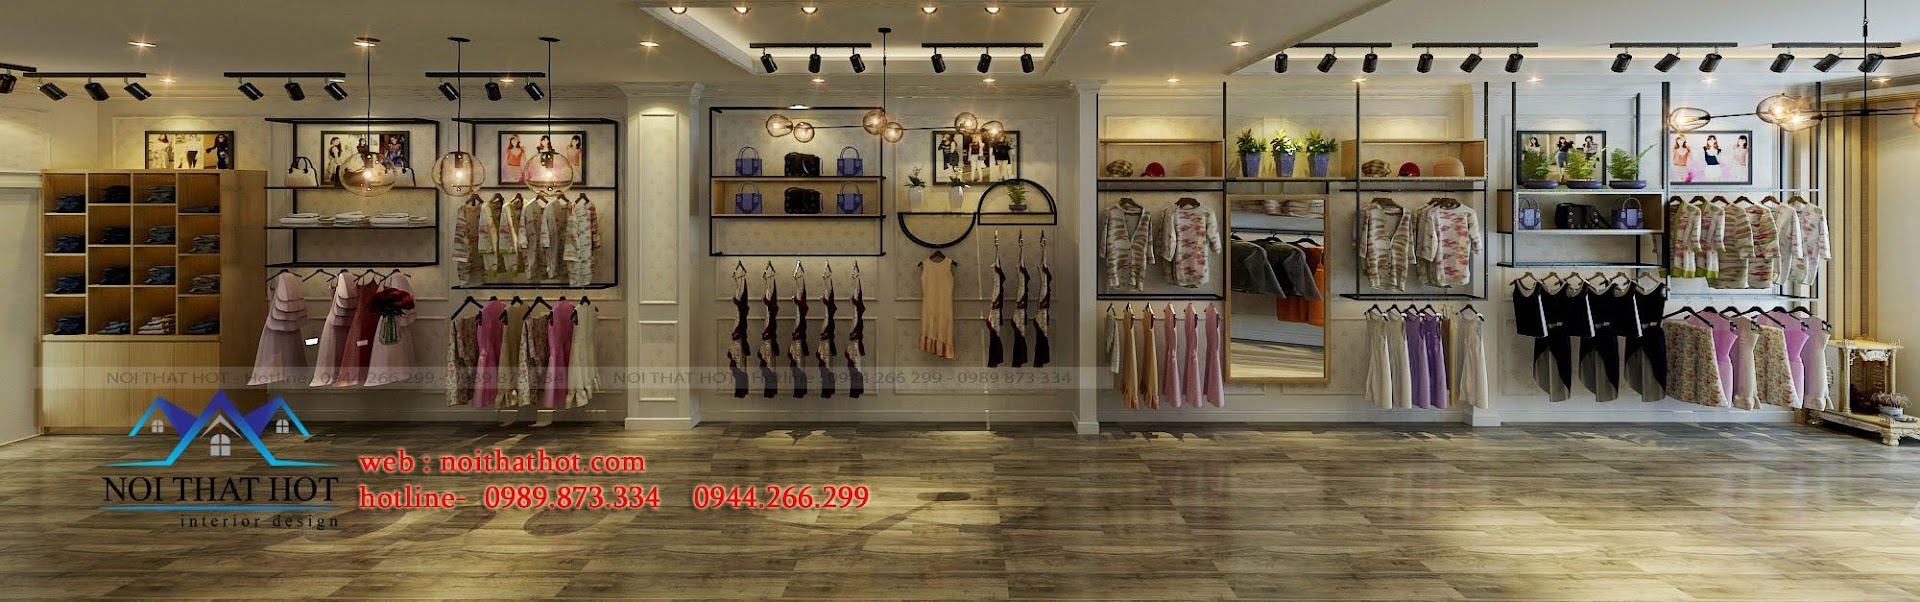 thiết kế shop thời trang nữ Bi's Boutique 9